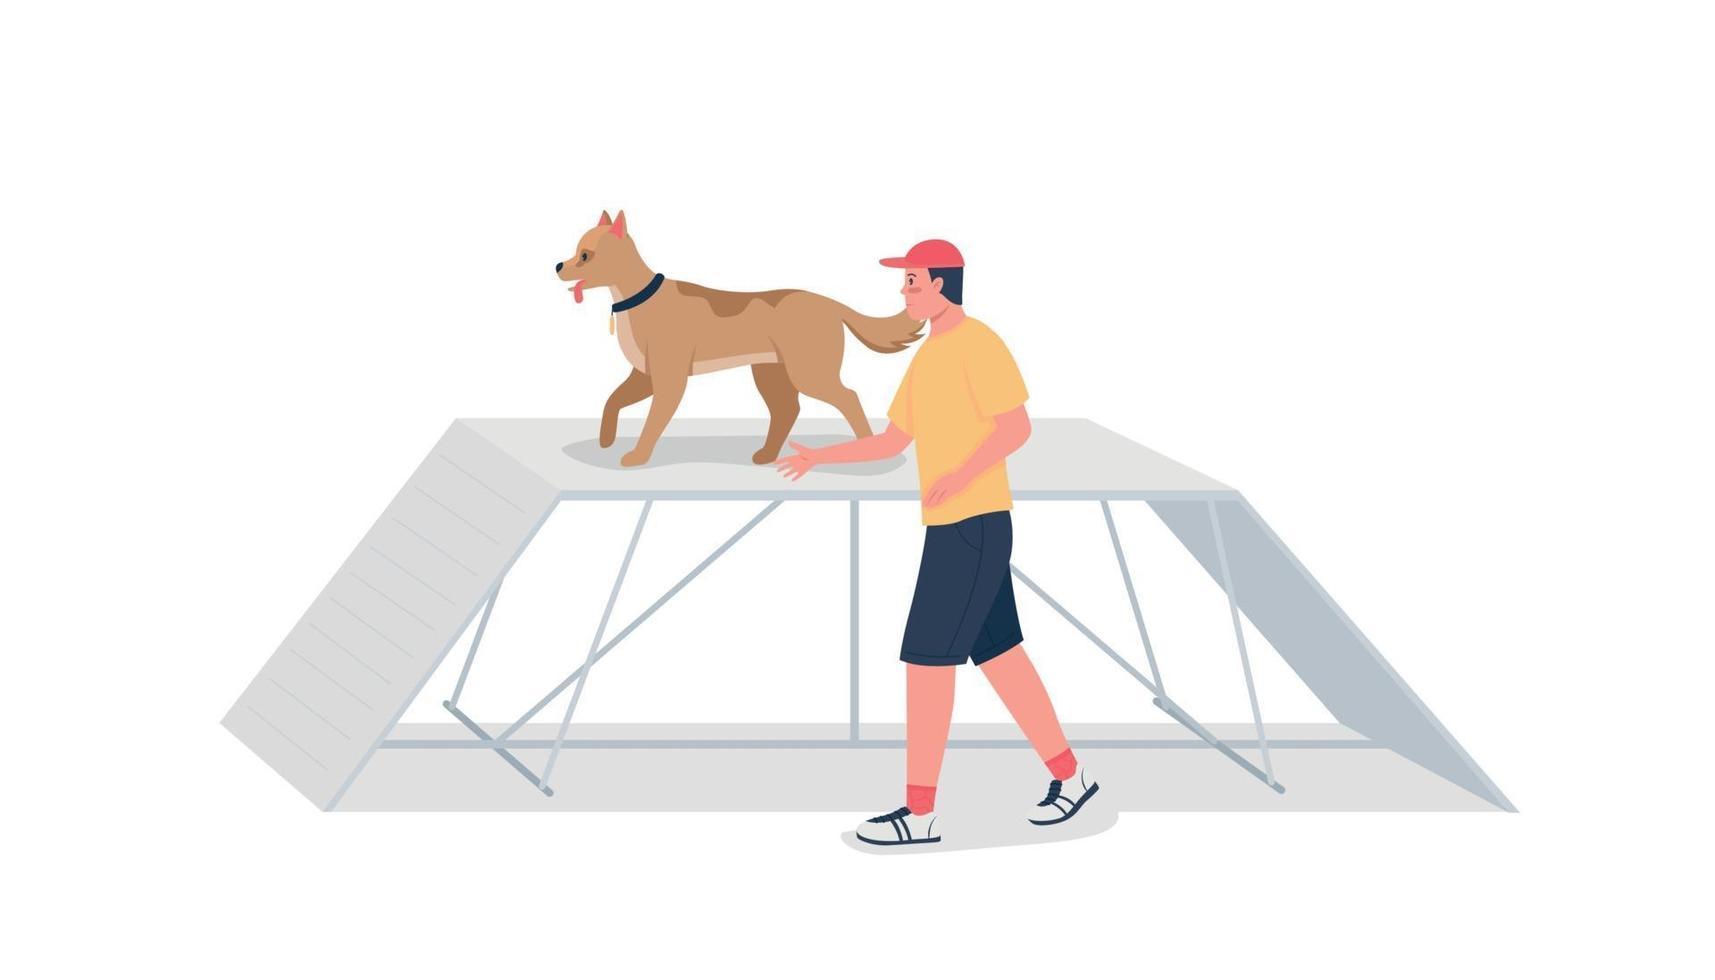 man opleiding hond op hindernissenparcours egale kleur vector gedetailleerd karakter